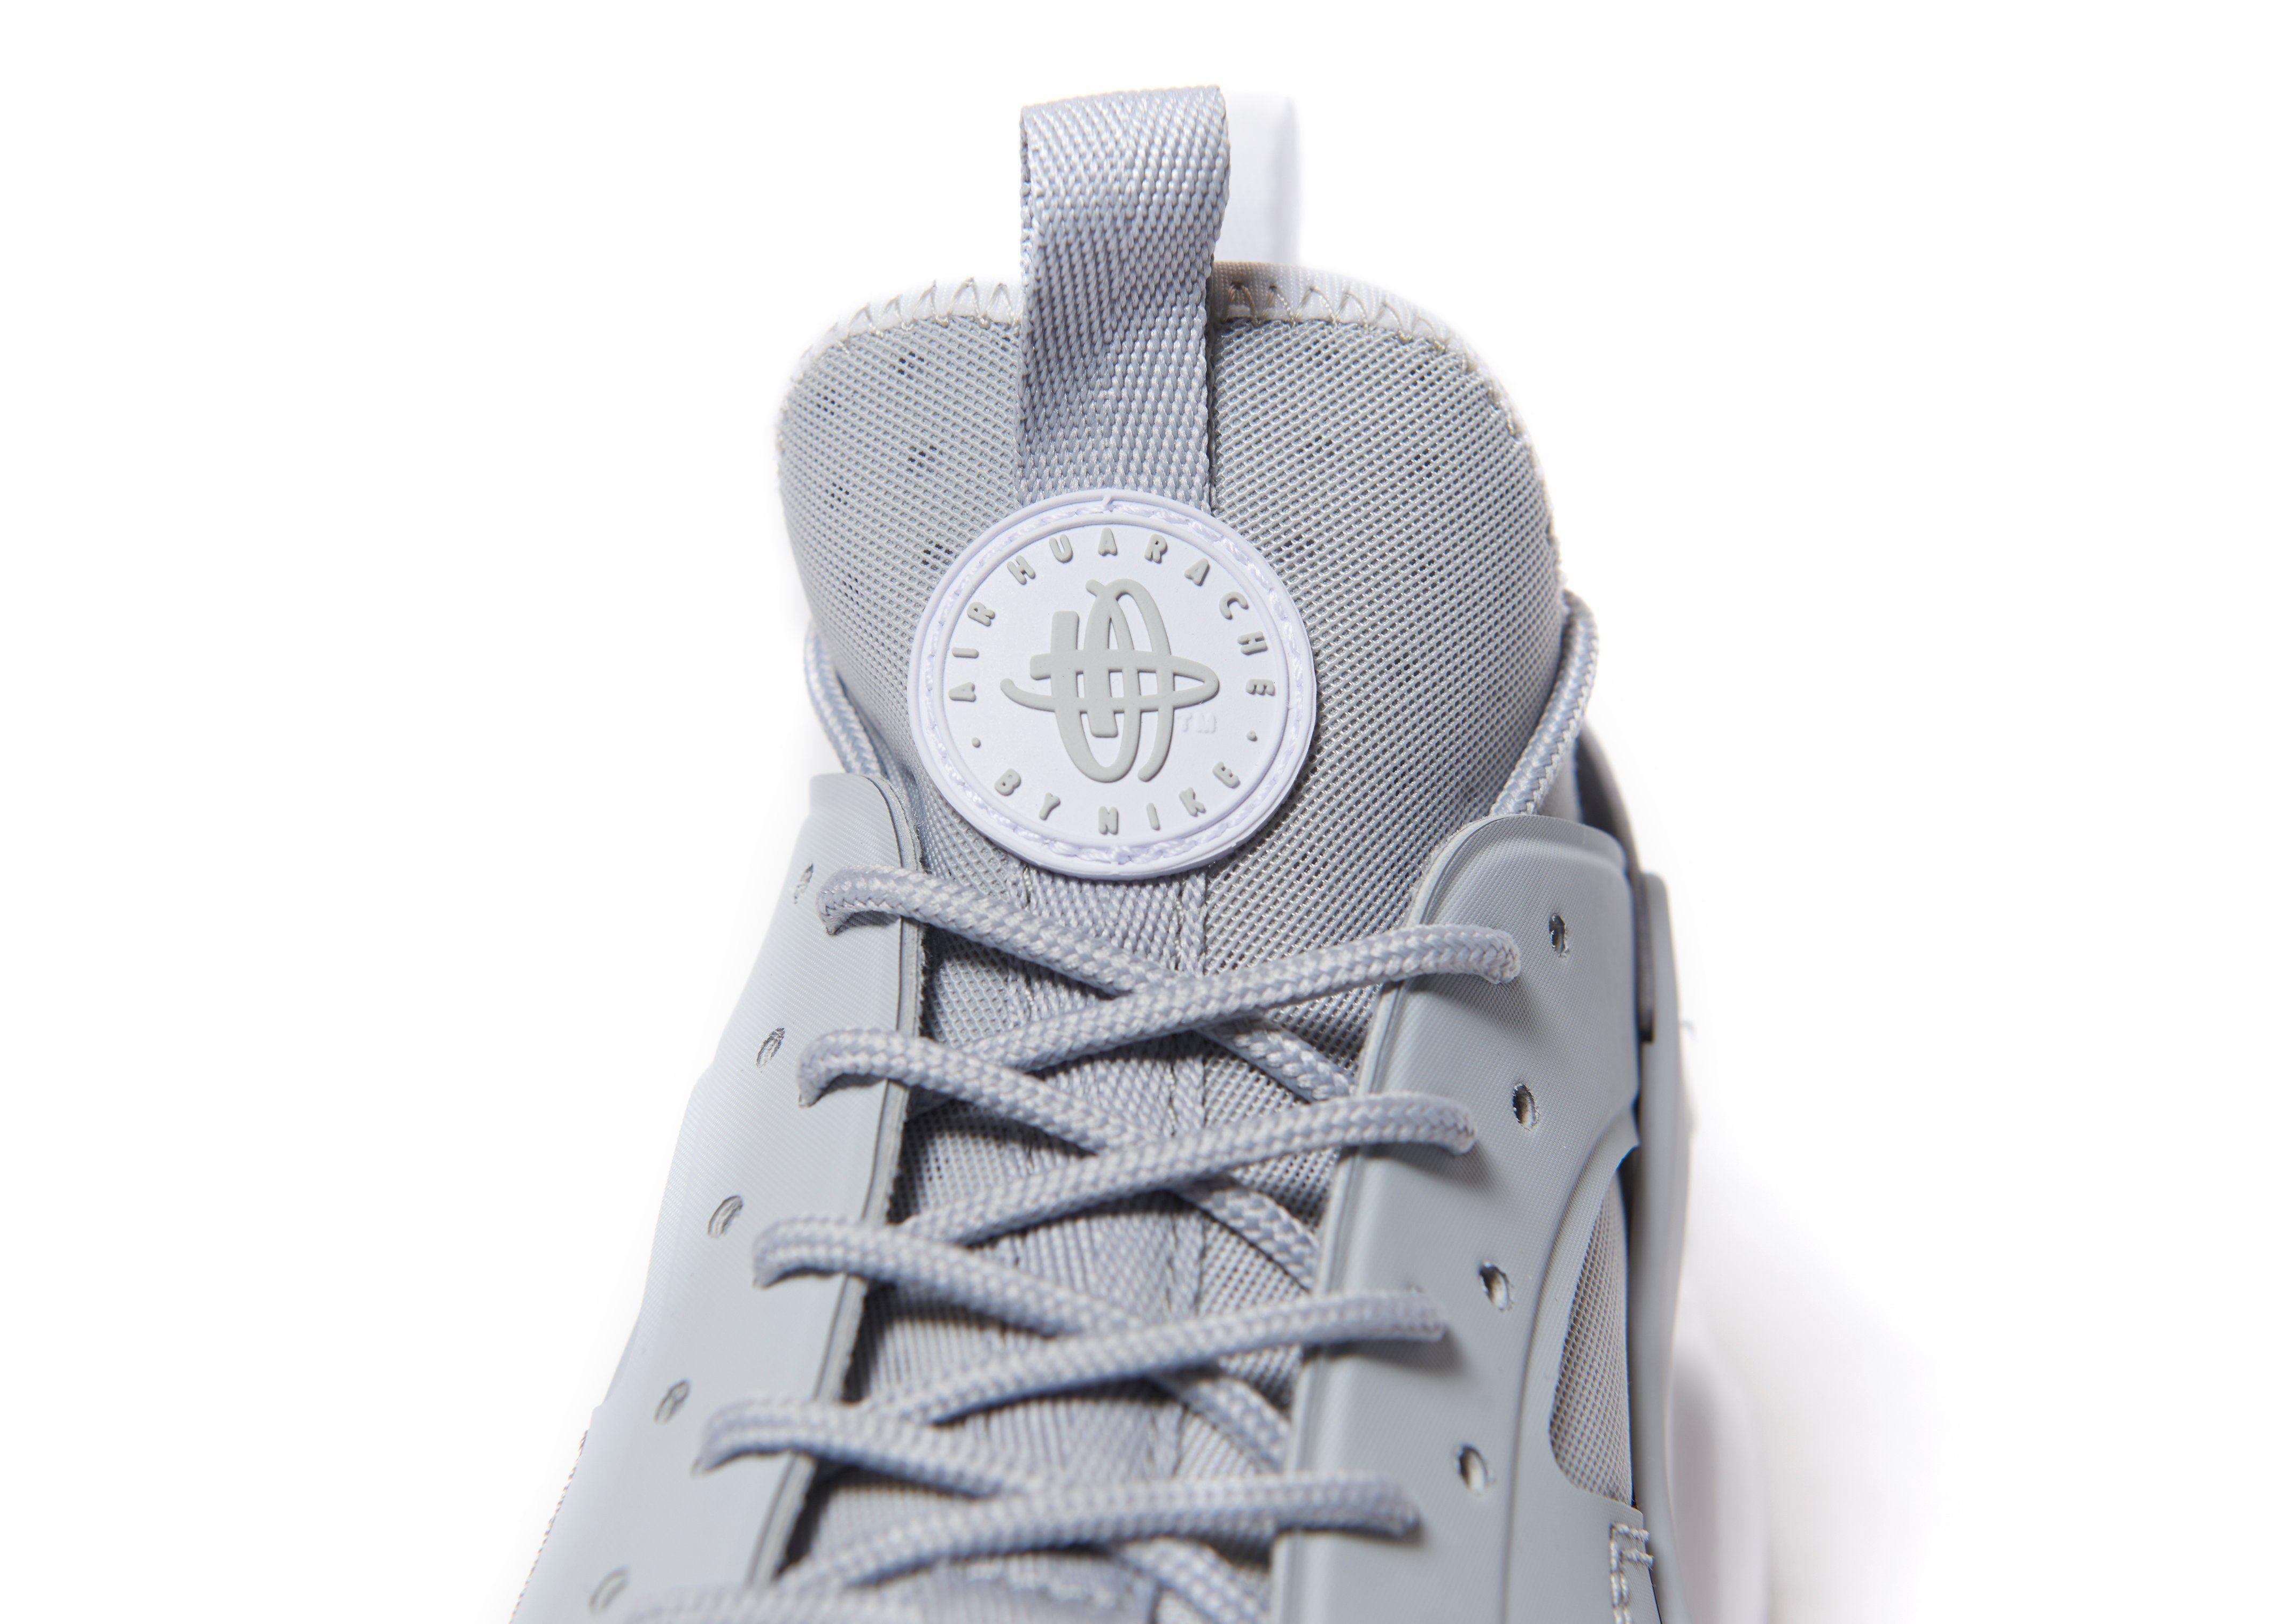 Nike Air Huarache Ultra Grau Freies Verschiffen Auslass 2018 Neueste Online-Verkauf Outlet Besten Preise Erschwinglicher Günstiger Preis jyPGLn